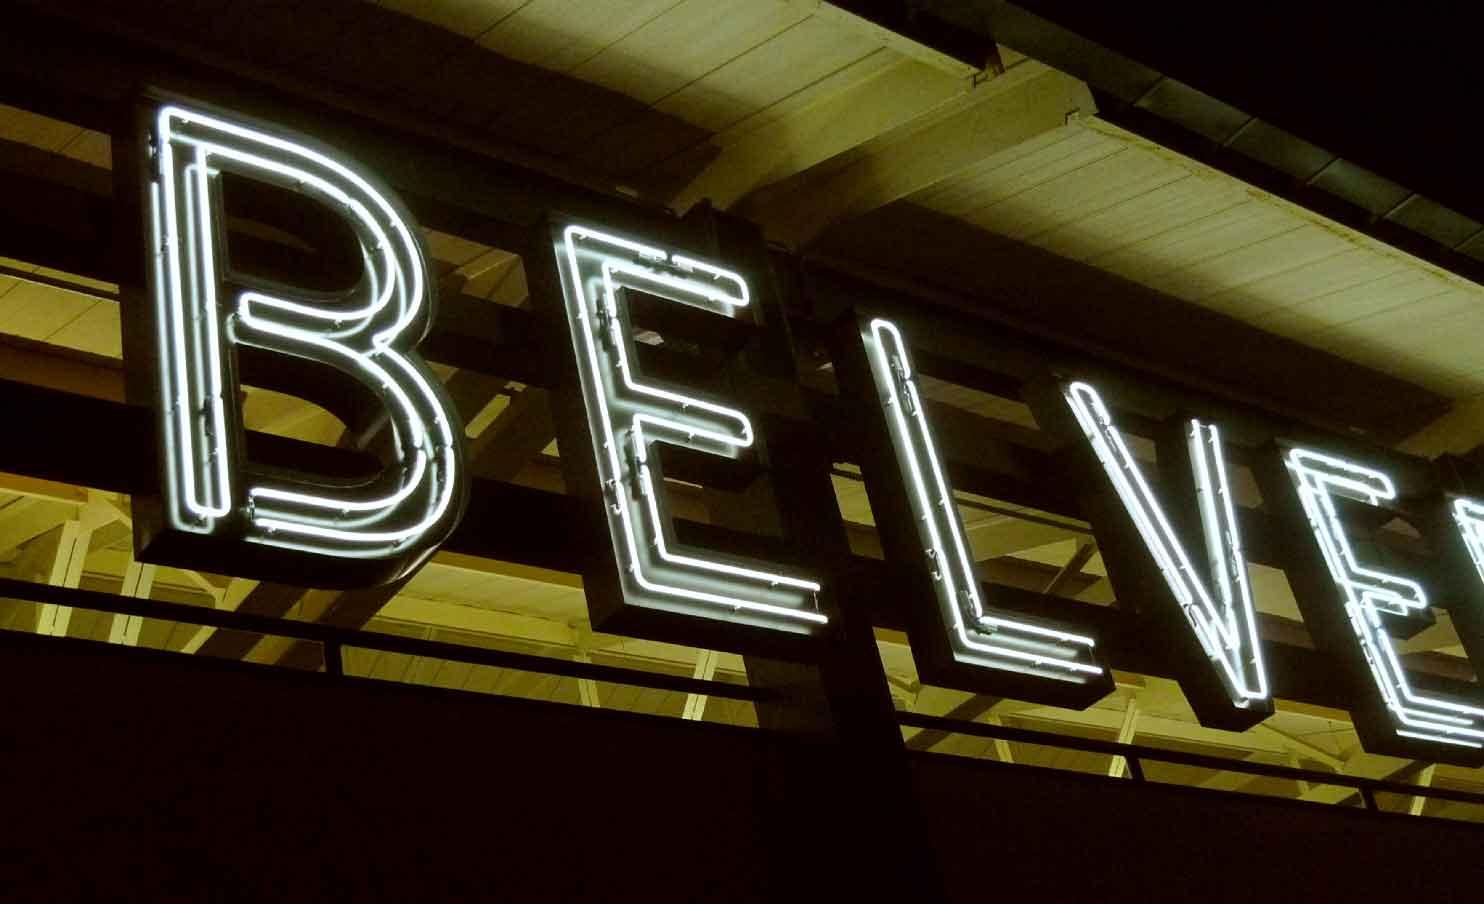 Ohm neon sign